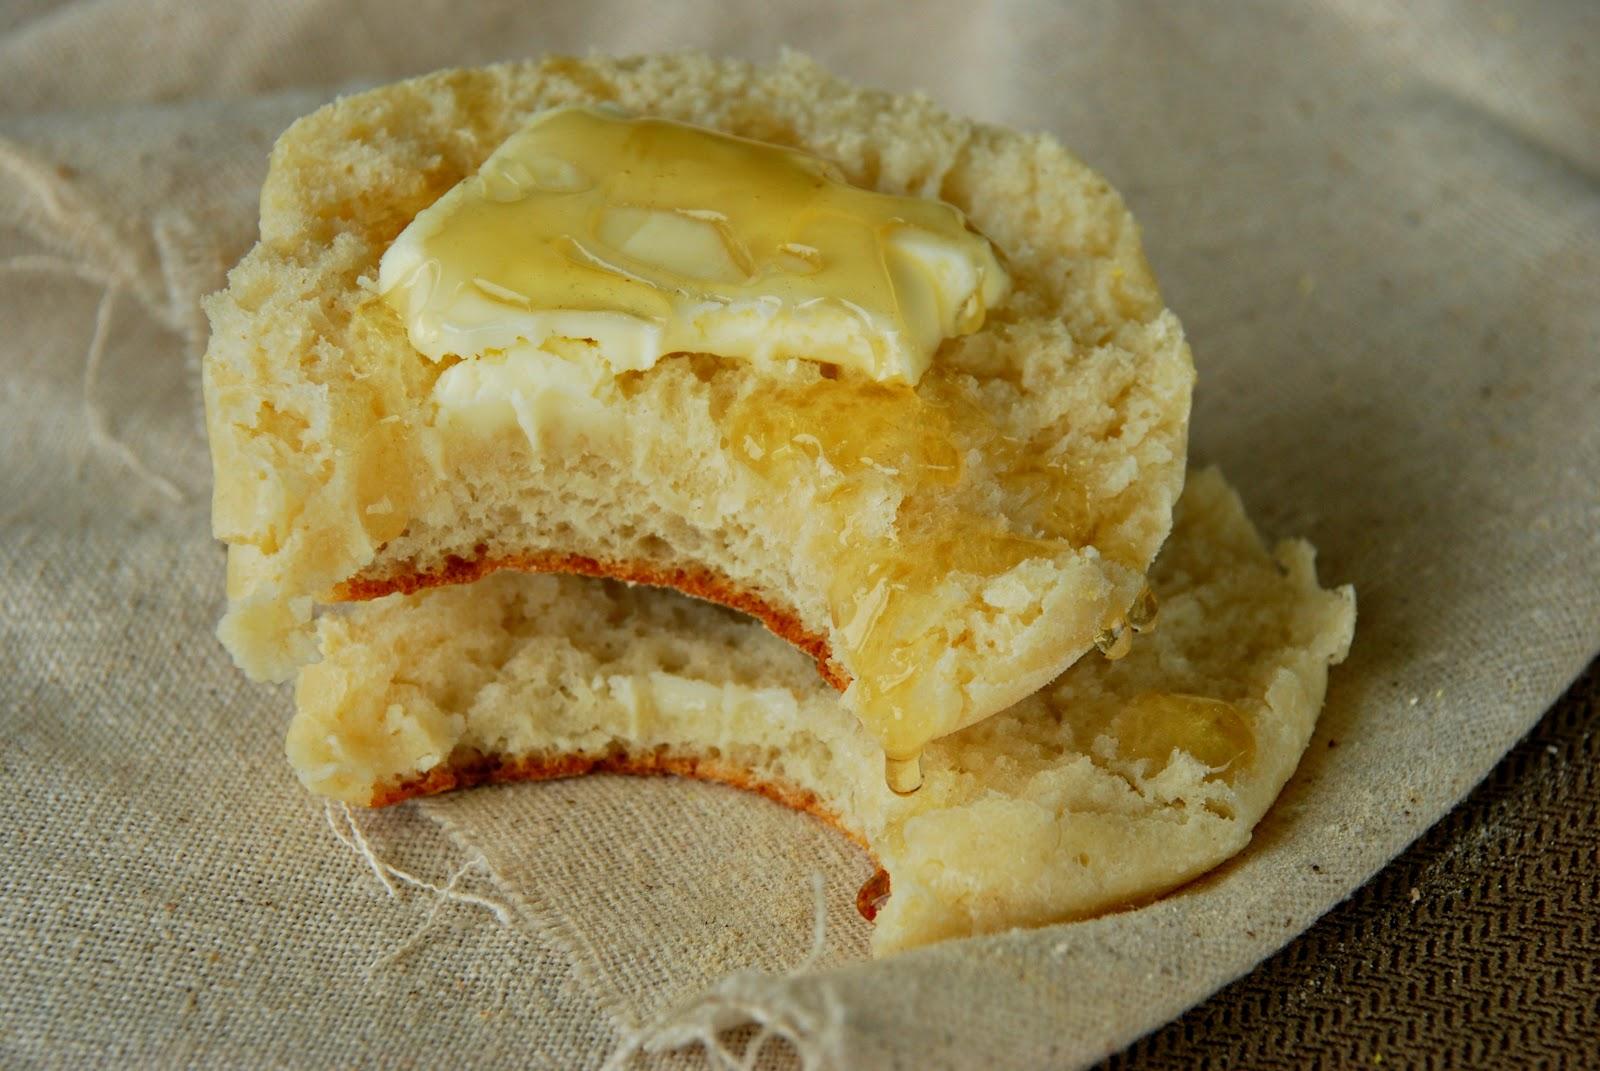 my fair baking: homemade english muffins